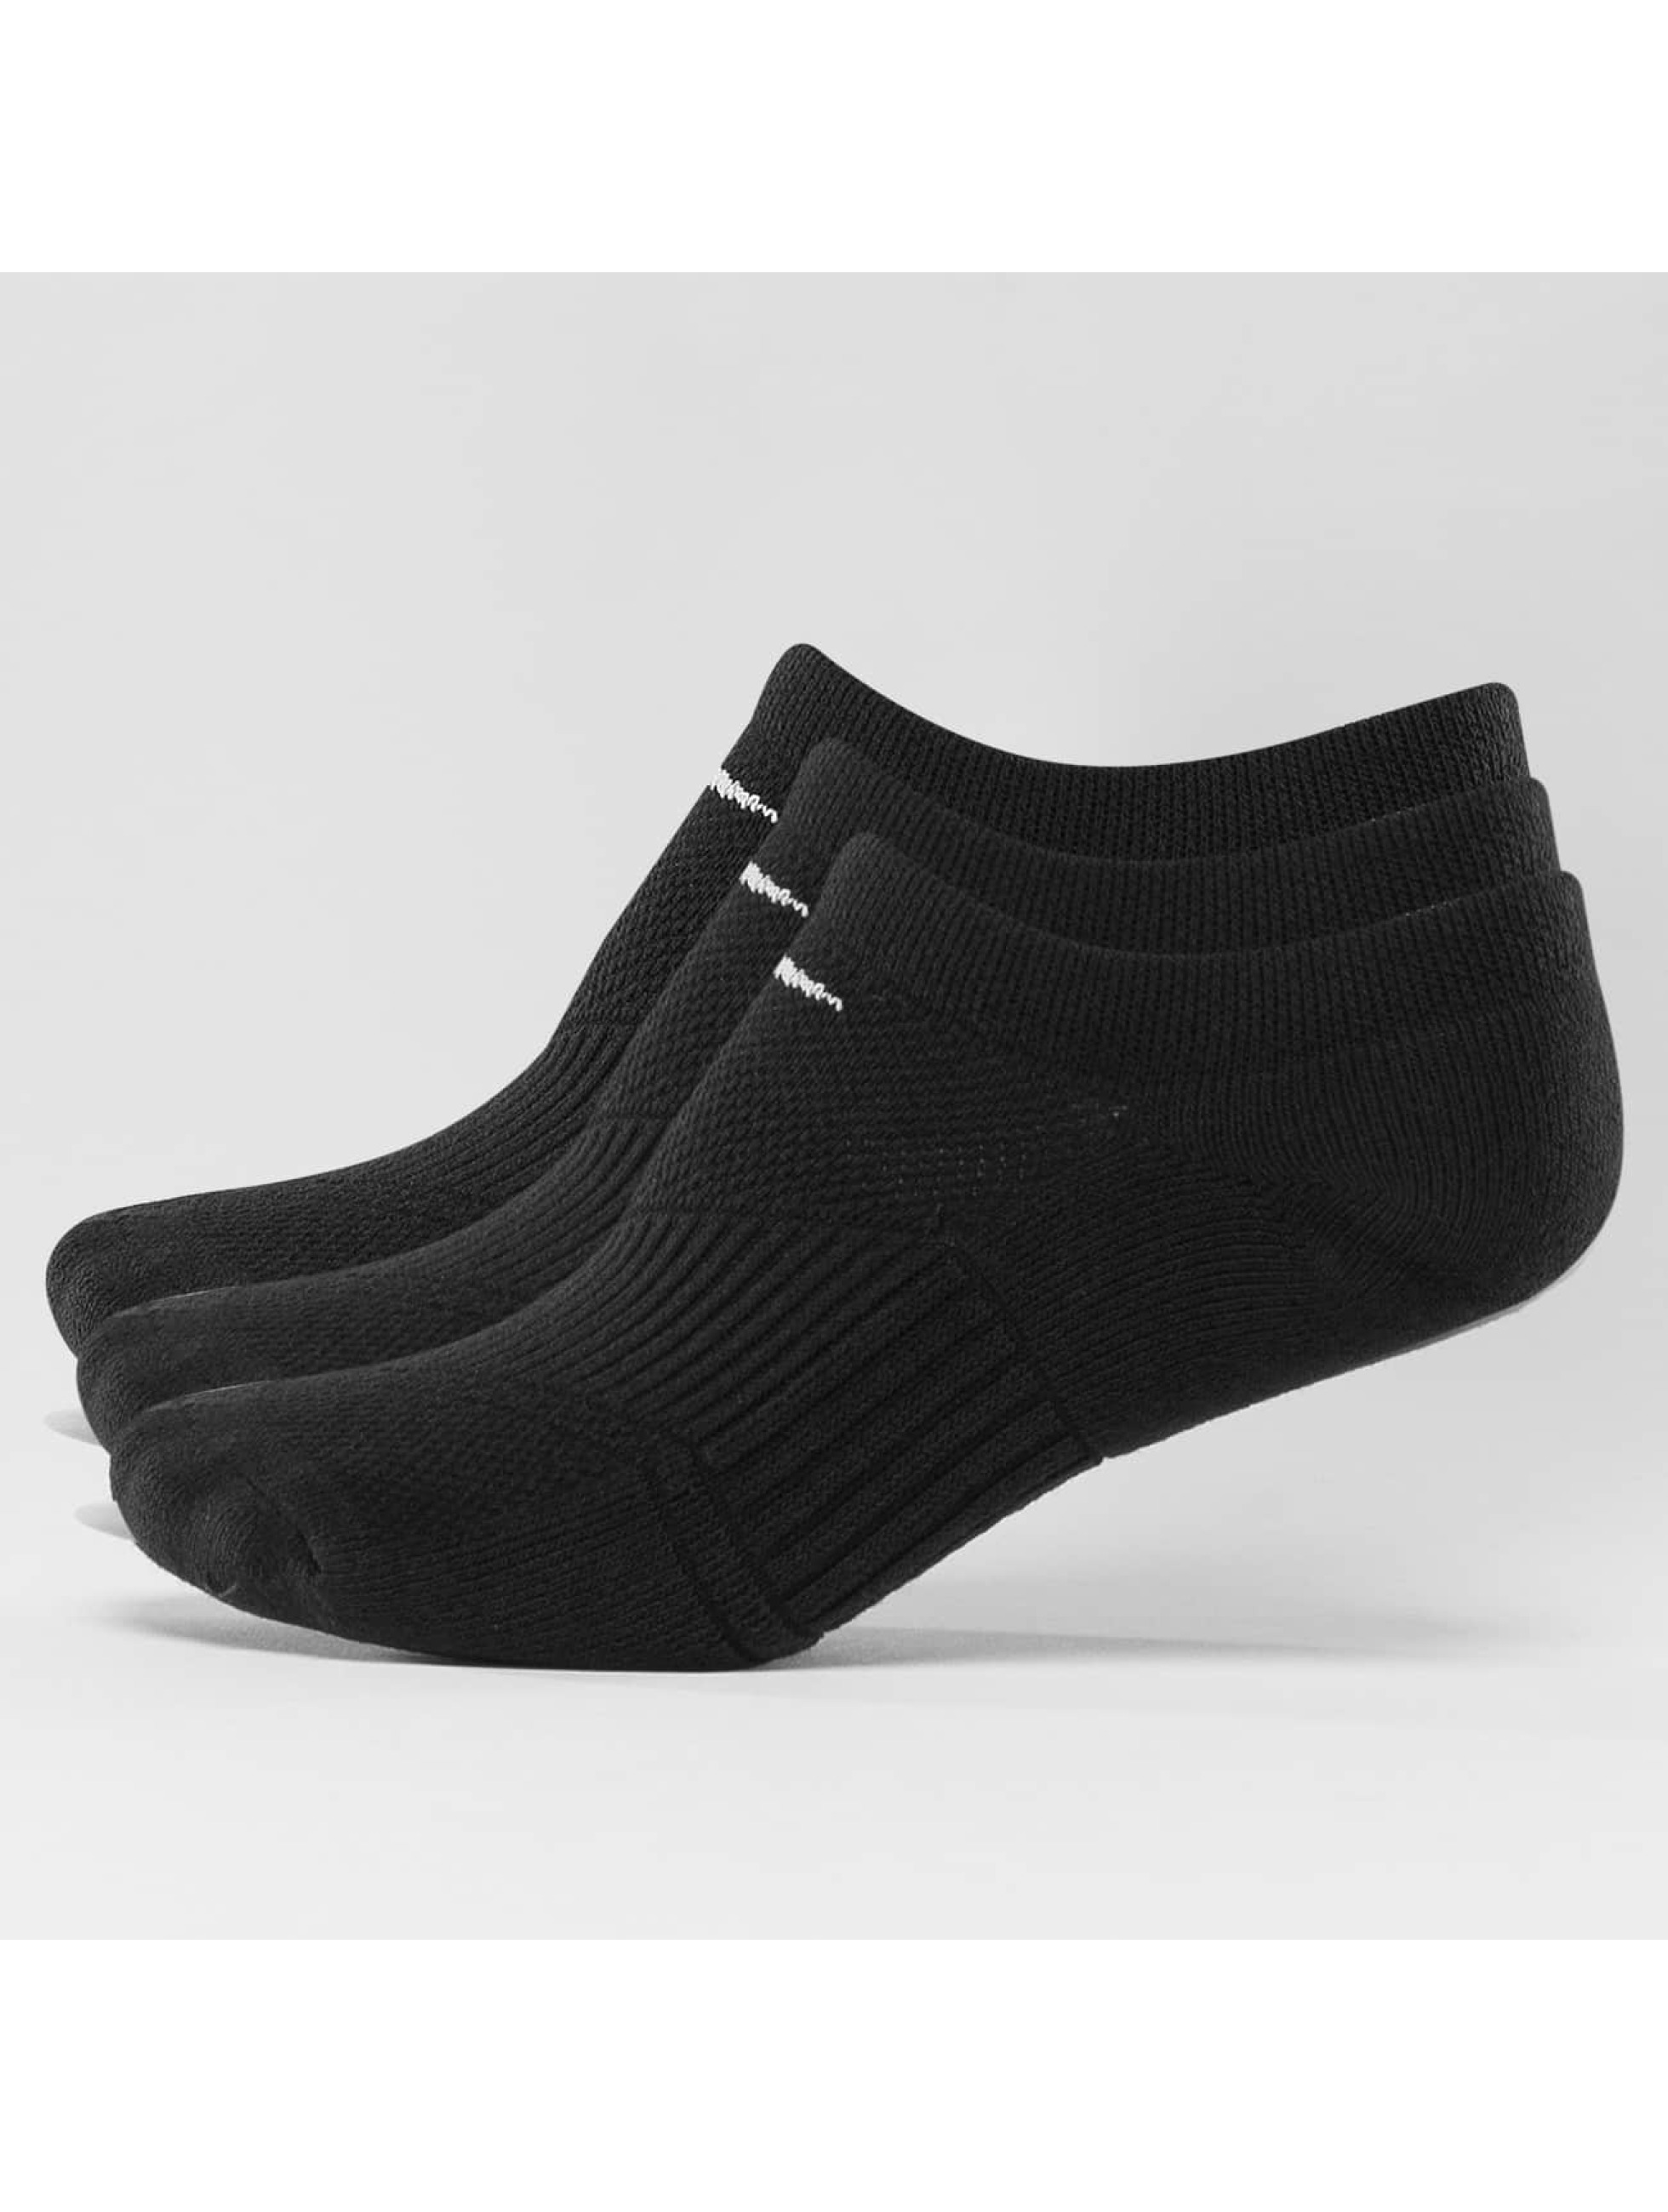 Nike Socks Cotton Cushion No Show black